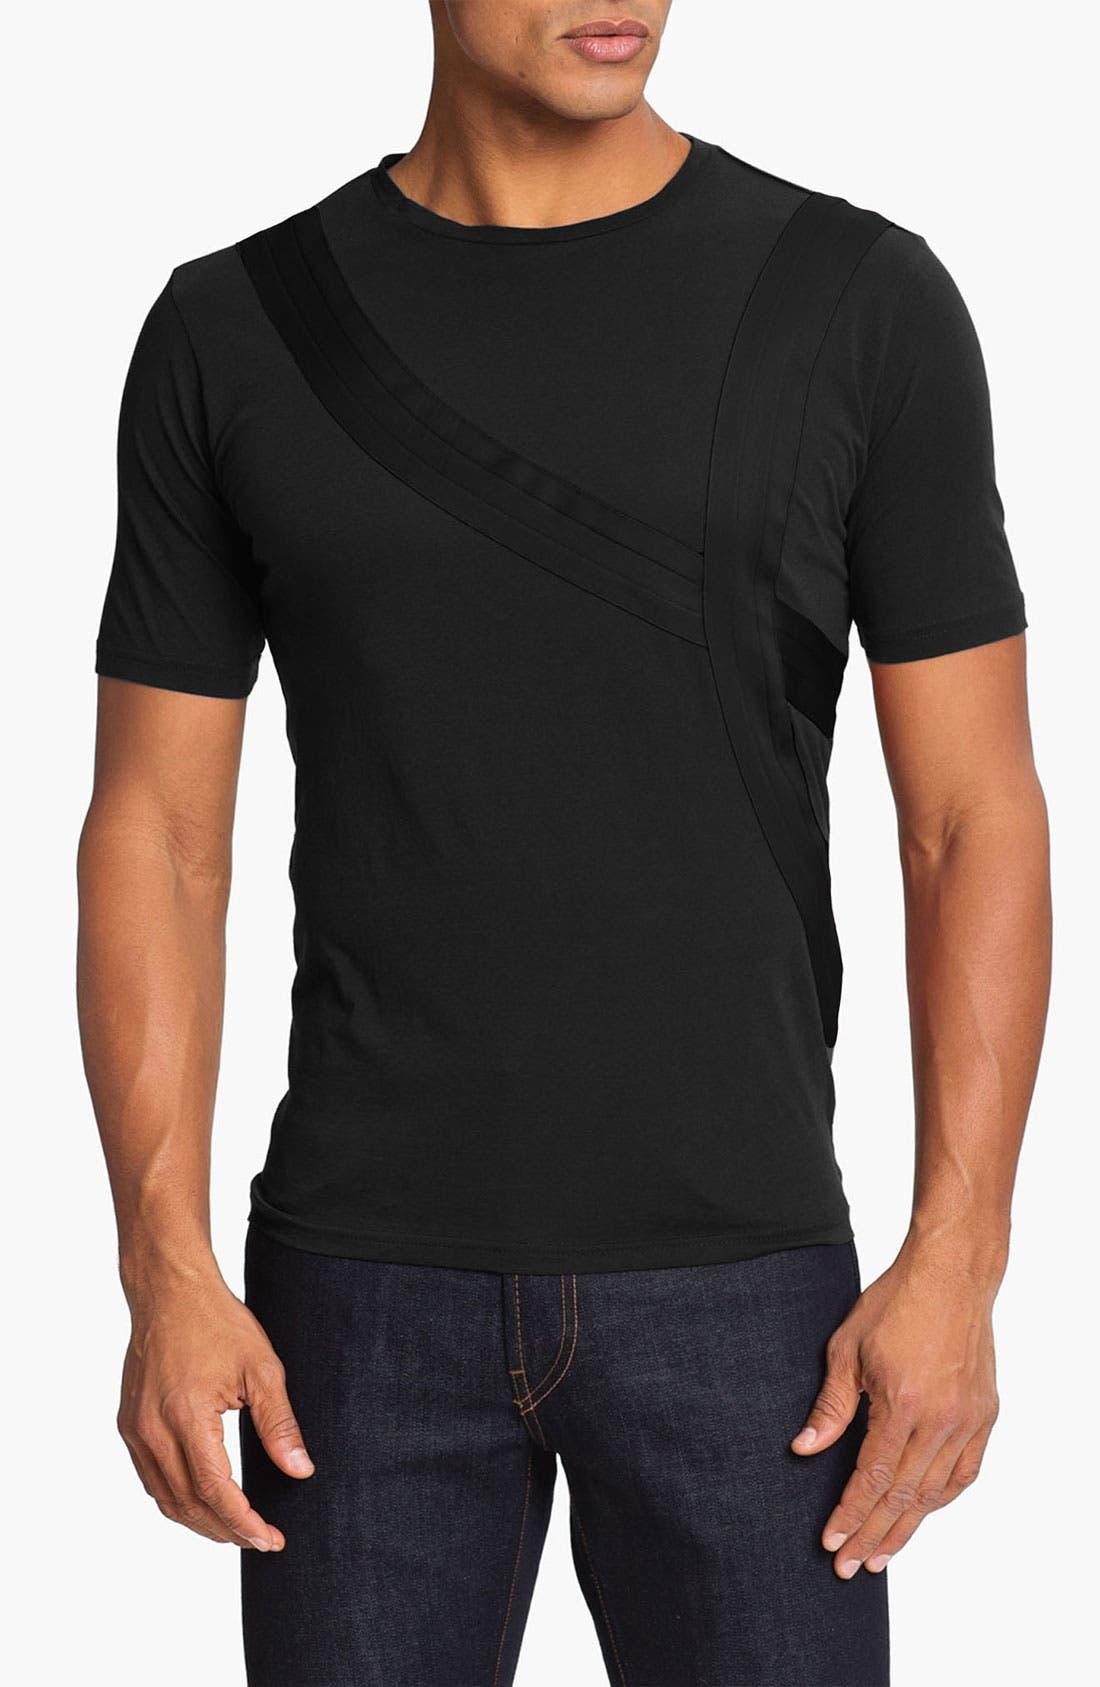 Alternate Image 1 Selected - adidas SLVR 'Bonded' T-Shirt